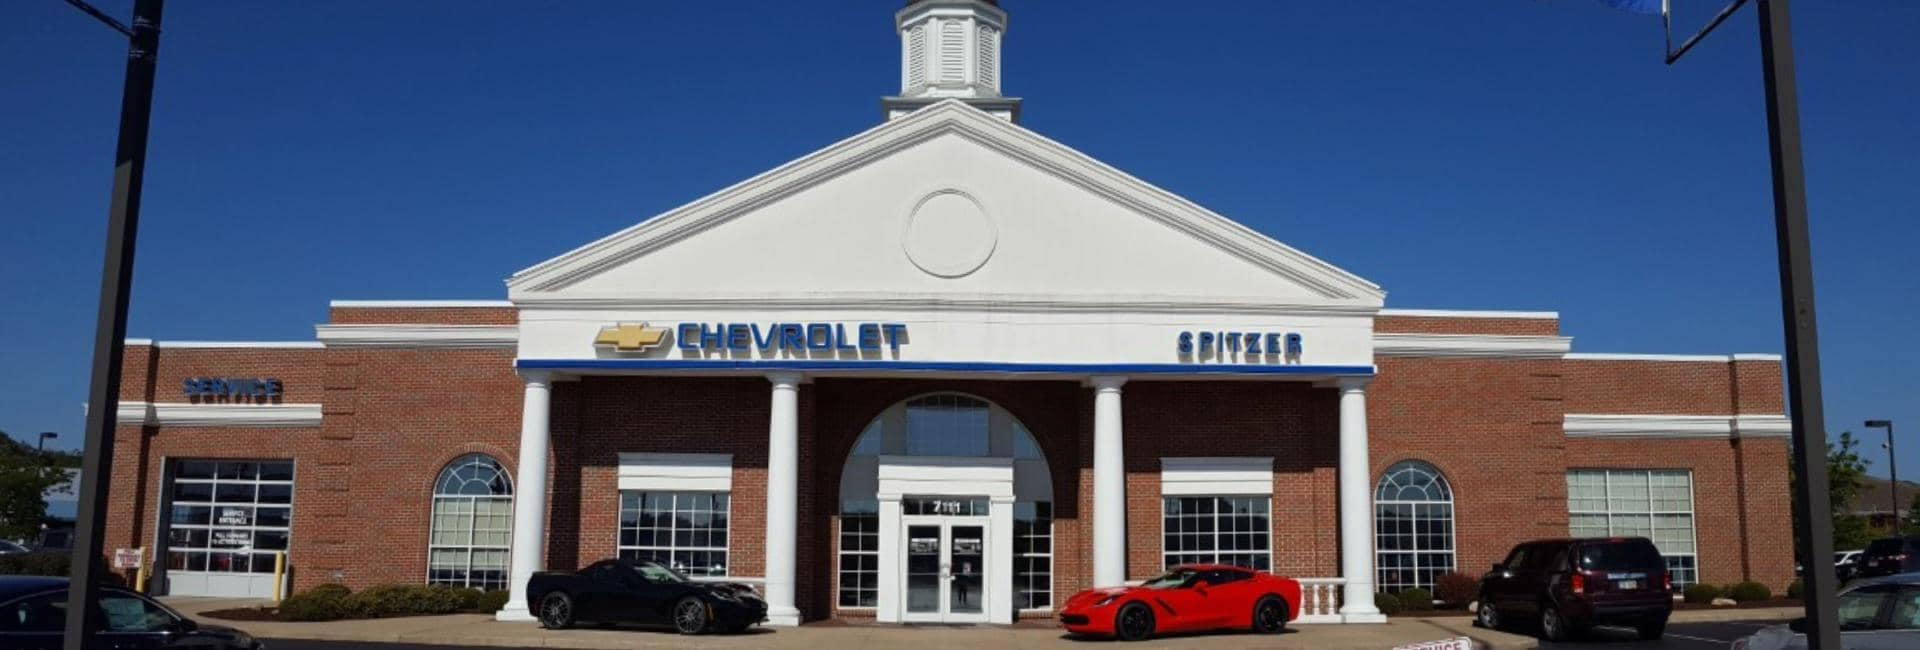 Spitzer Chevrolet North Canton